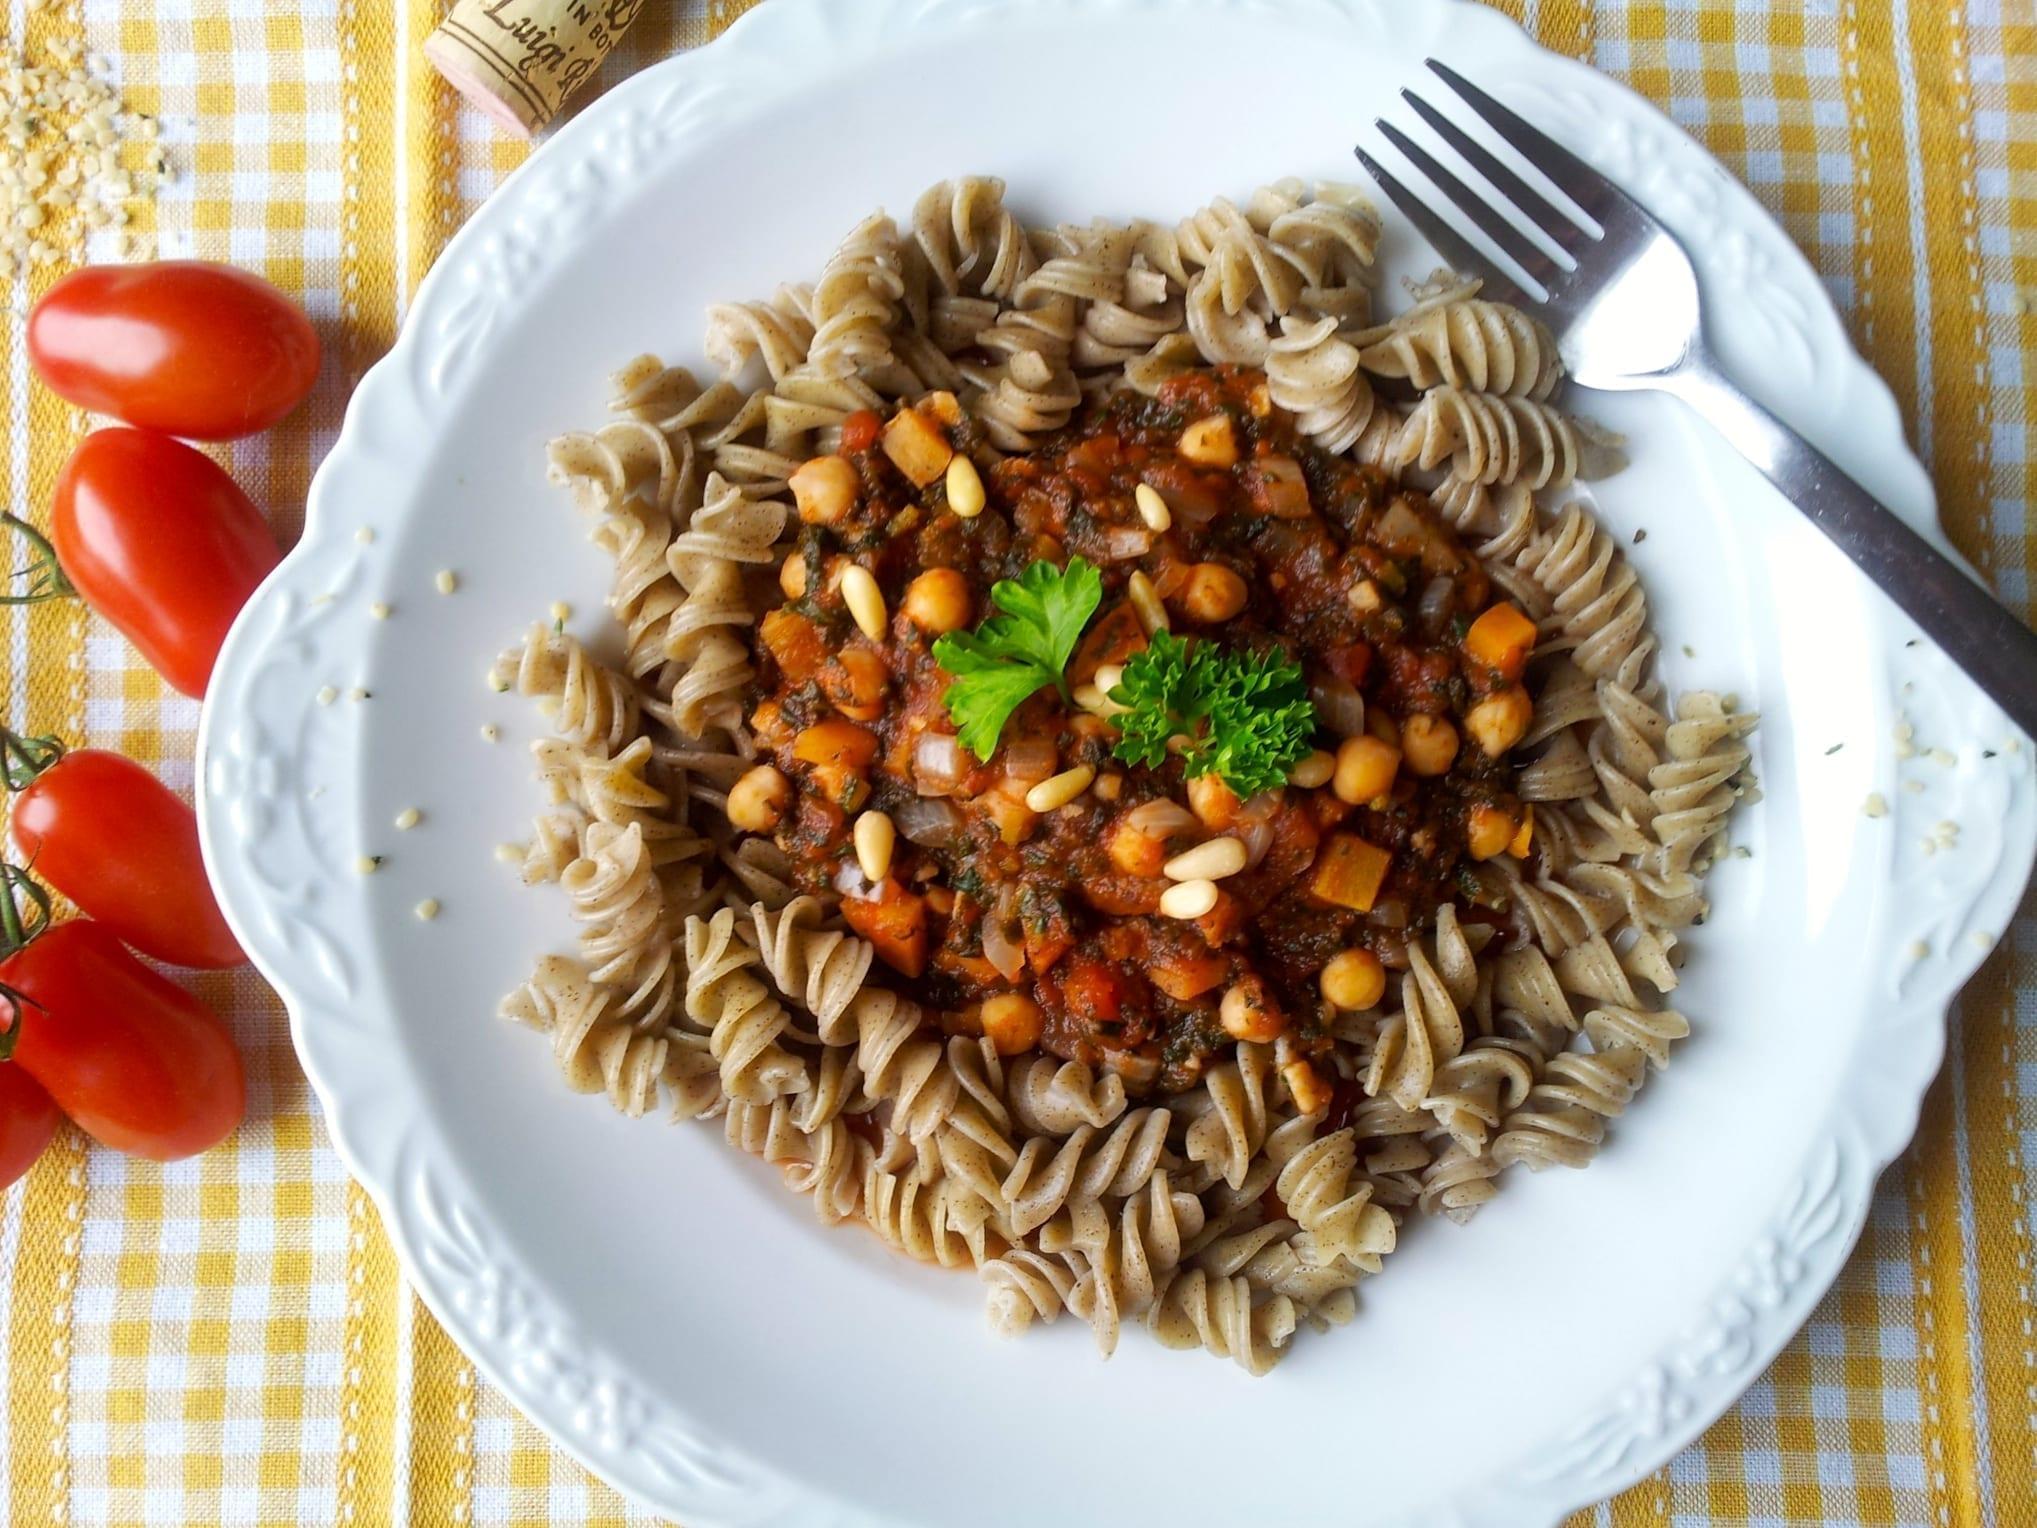 recipe, lunch, dinner, pasta, tomato sauce, chickpeas, spinach, hemp, vegan, plant based, lactose-free, casein-free, sugar-free, oil-free, egg-free